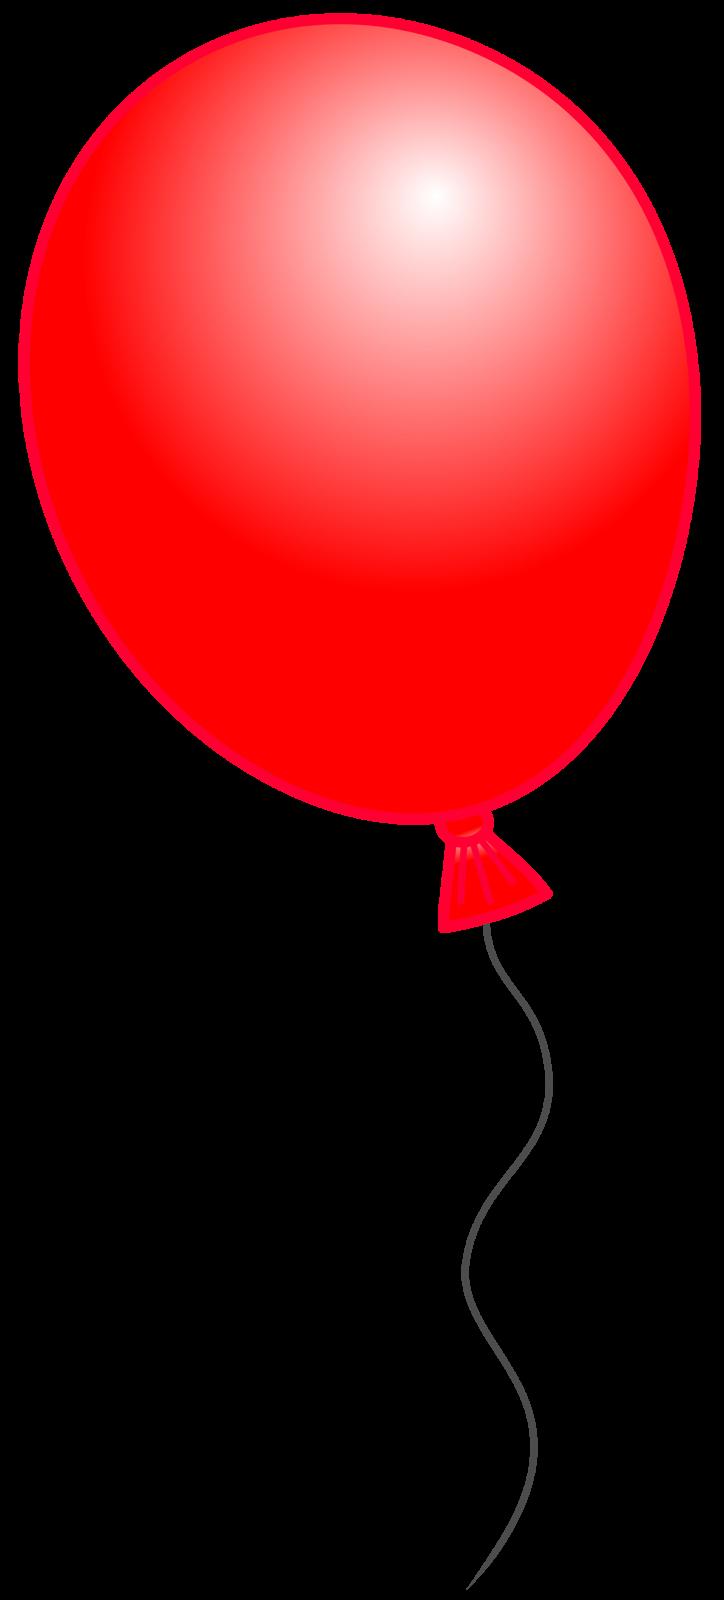 724x1600 Balloon Clip Art